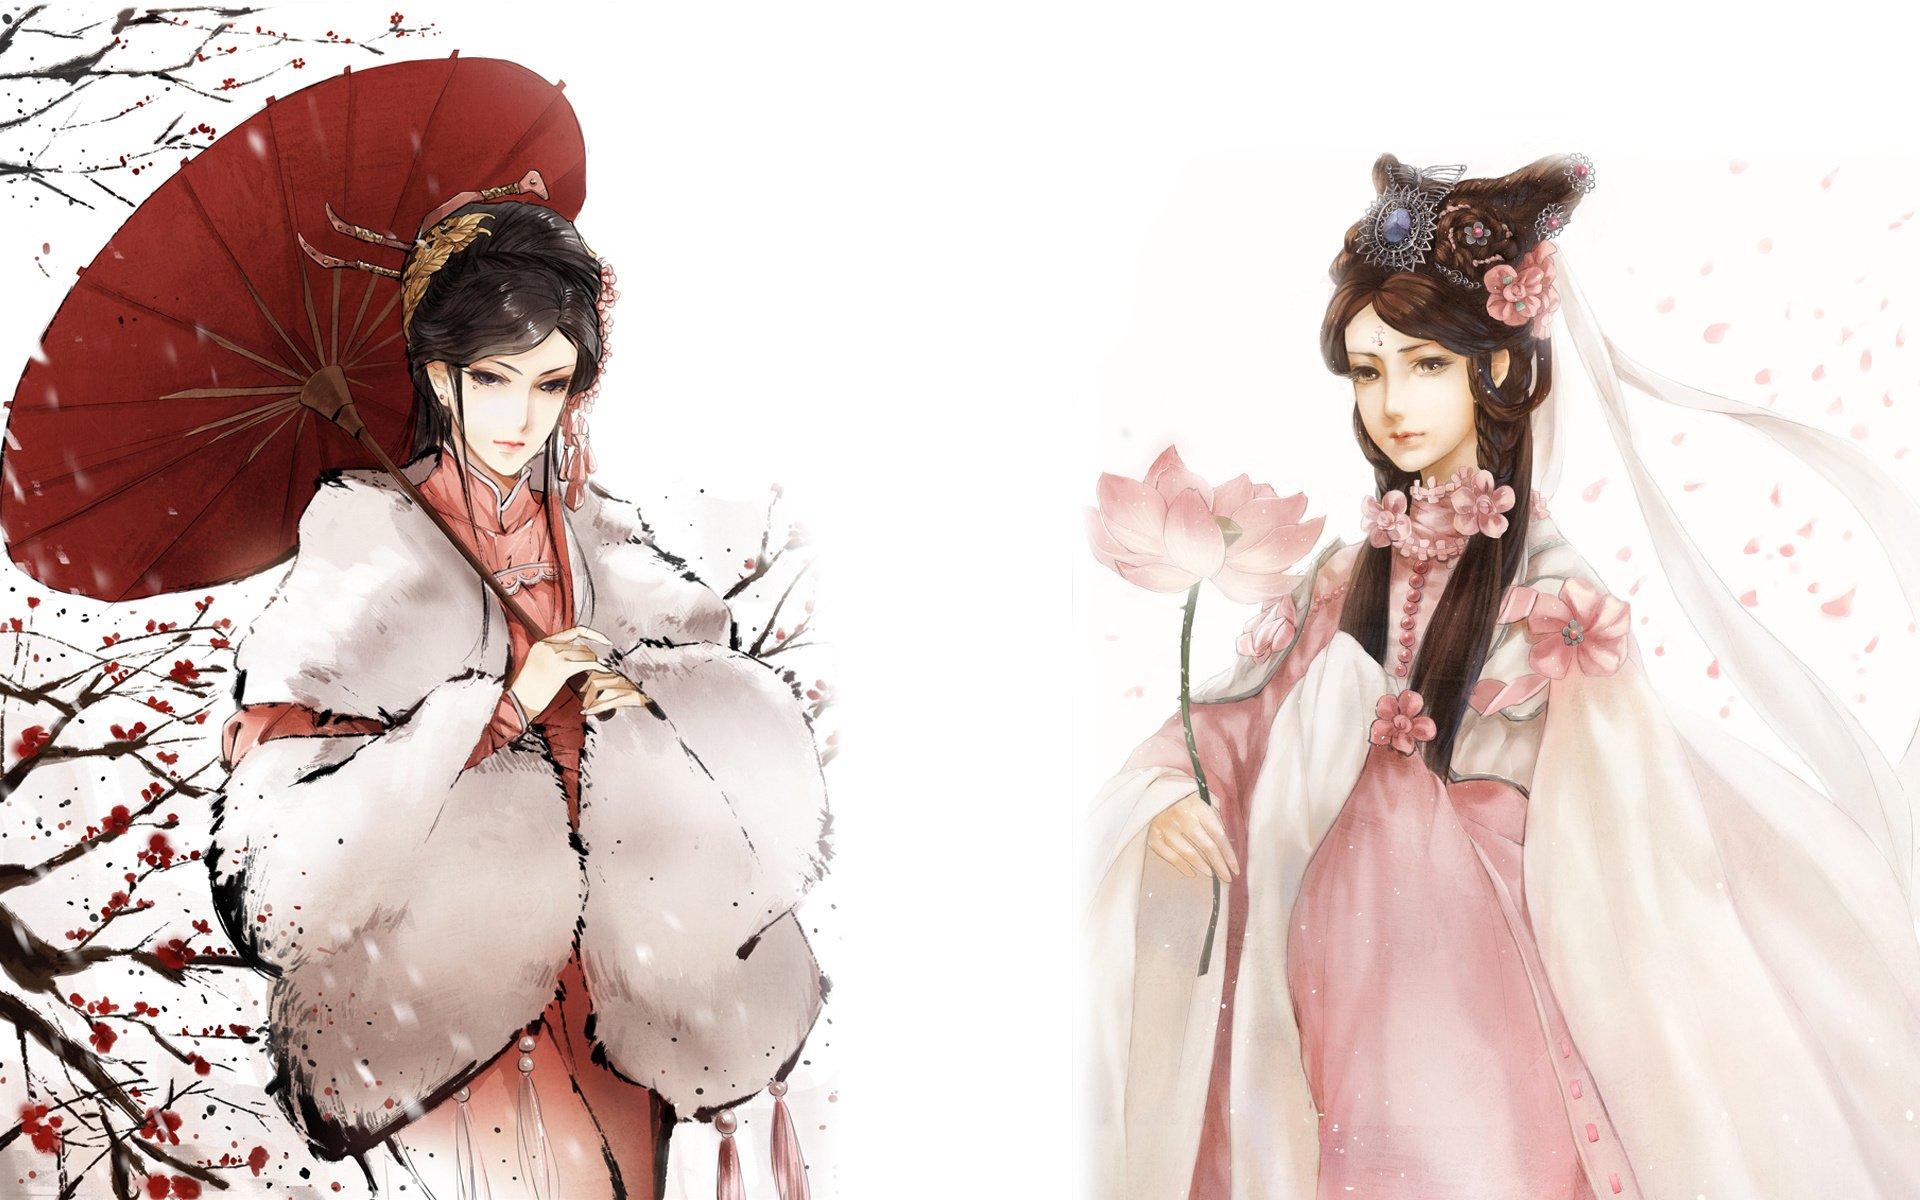 Beautiful Chinese Girl Paintings Widescreen Wallpaper Original Hd Wallpaper Background Image 1920x1200 Id